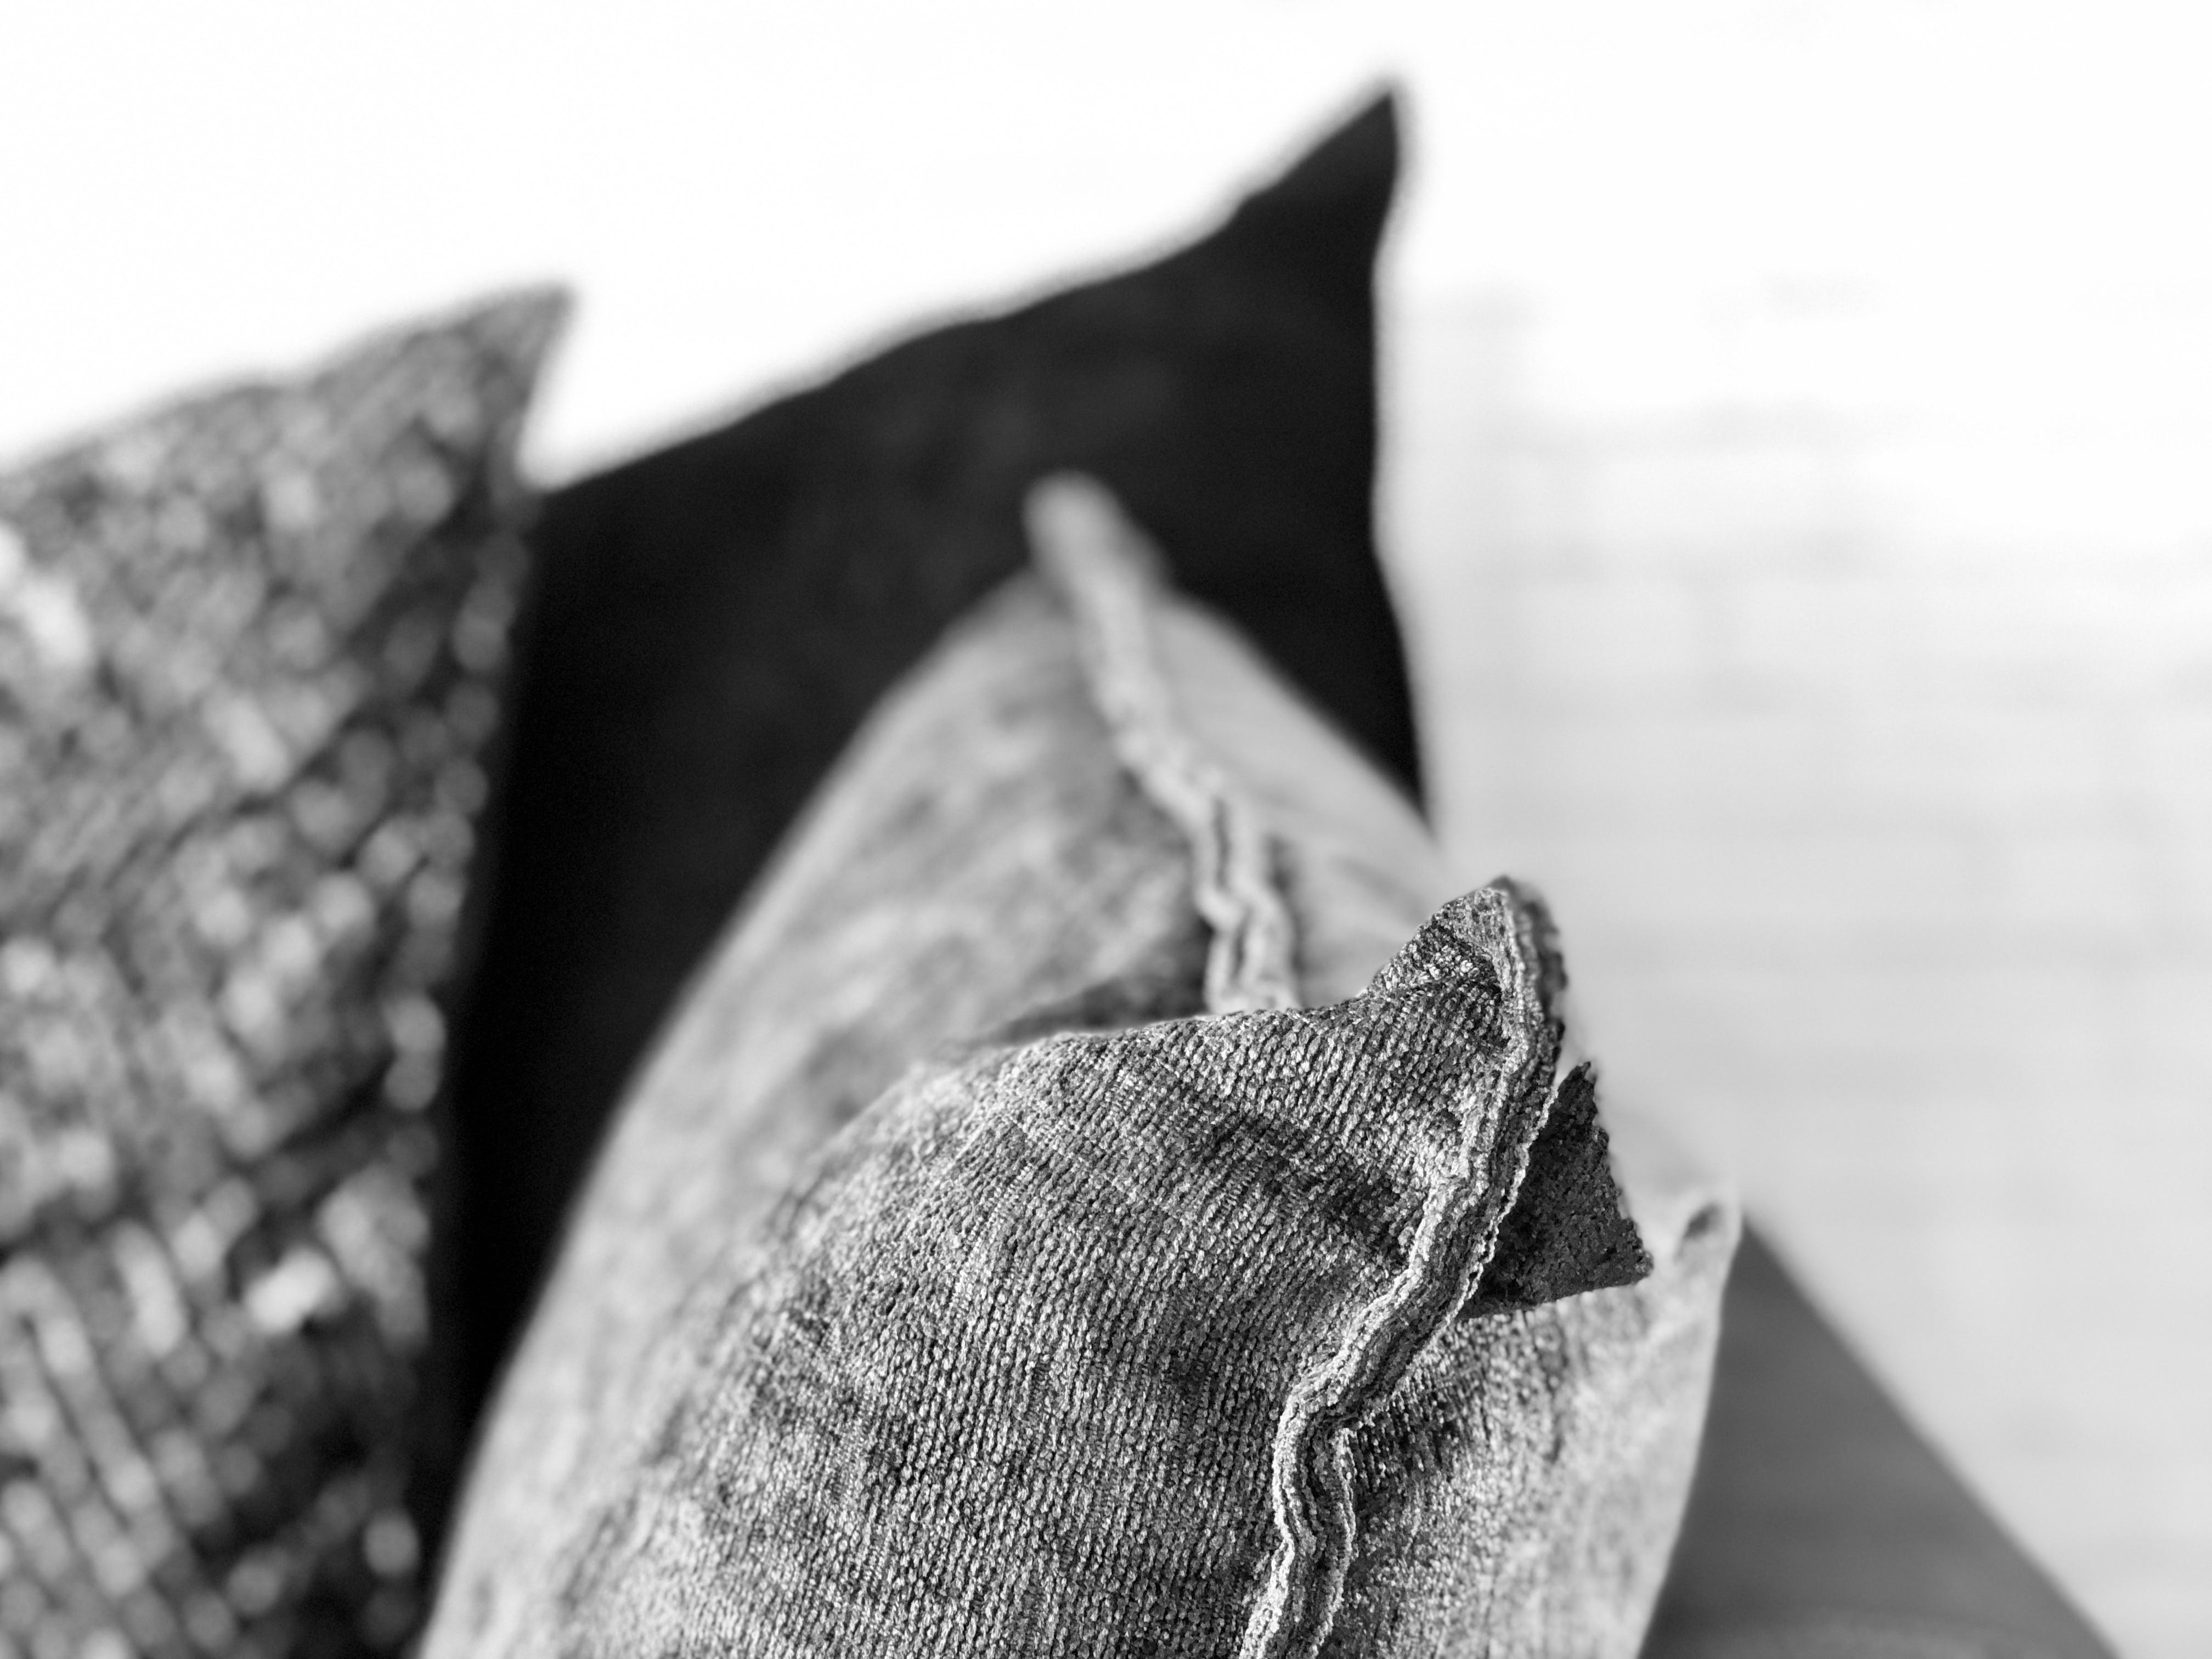 Free stock photo of texture, chair, sofa, pillows